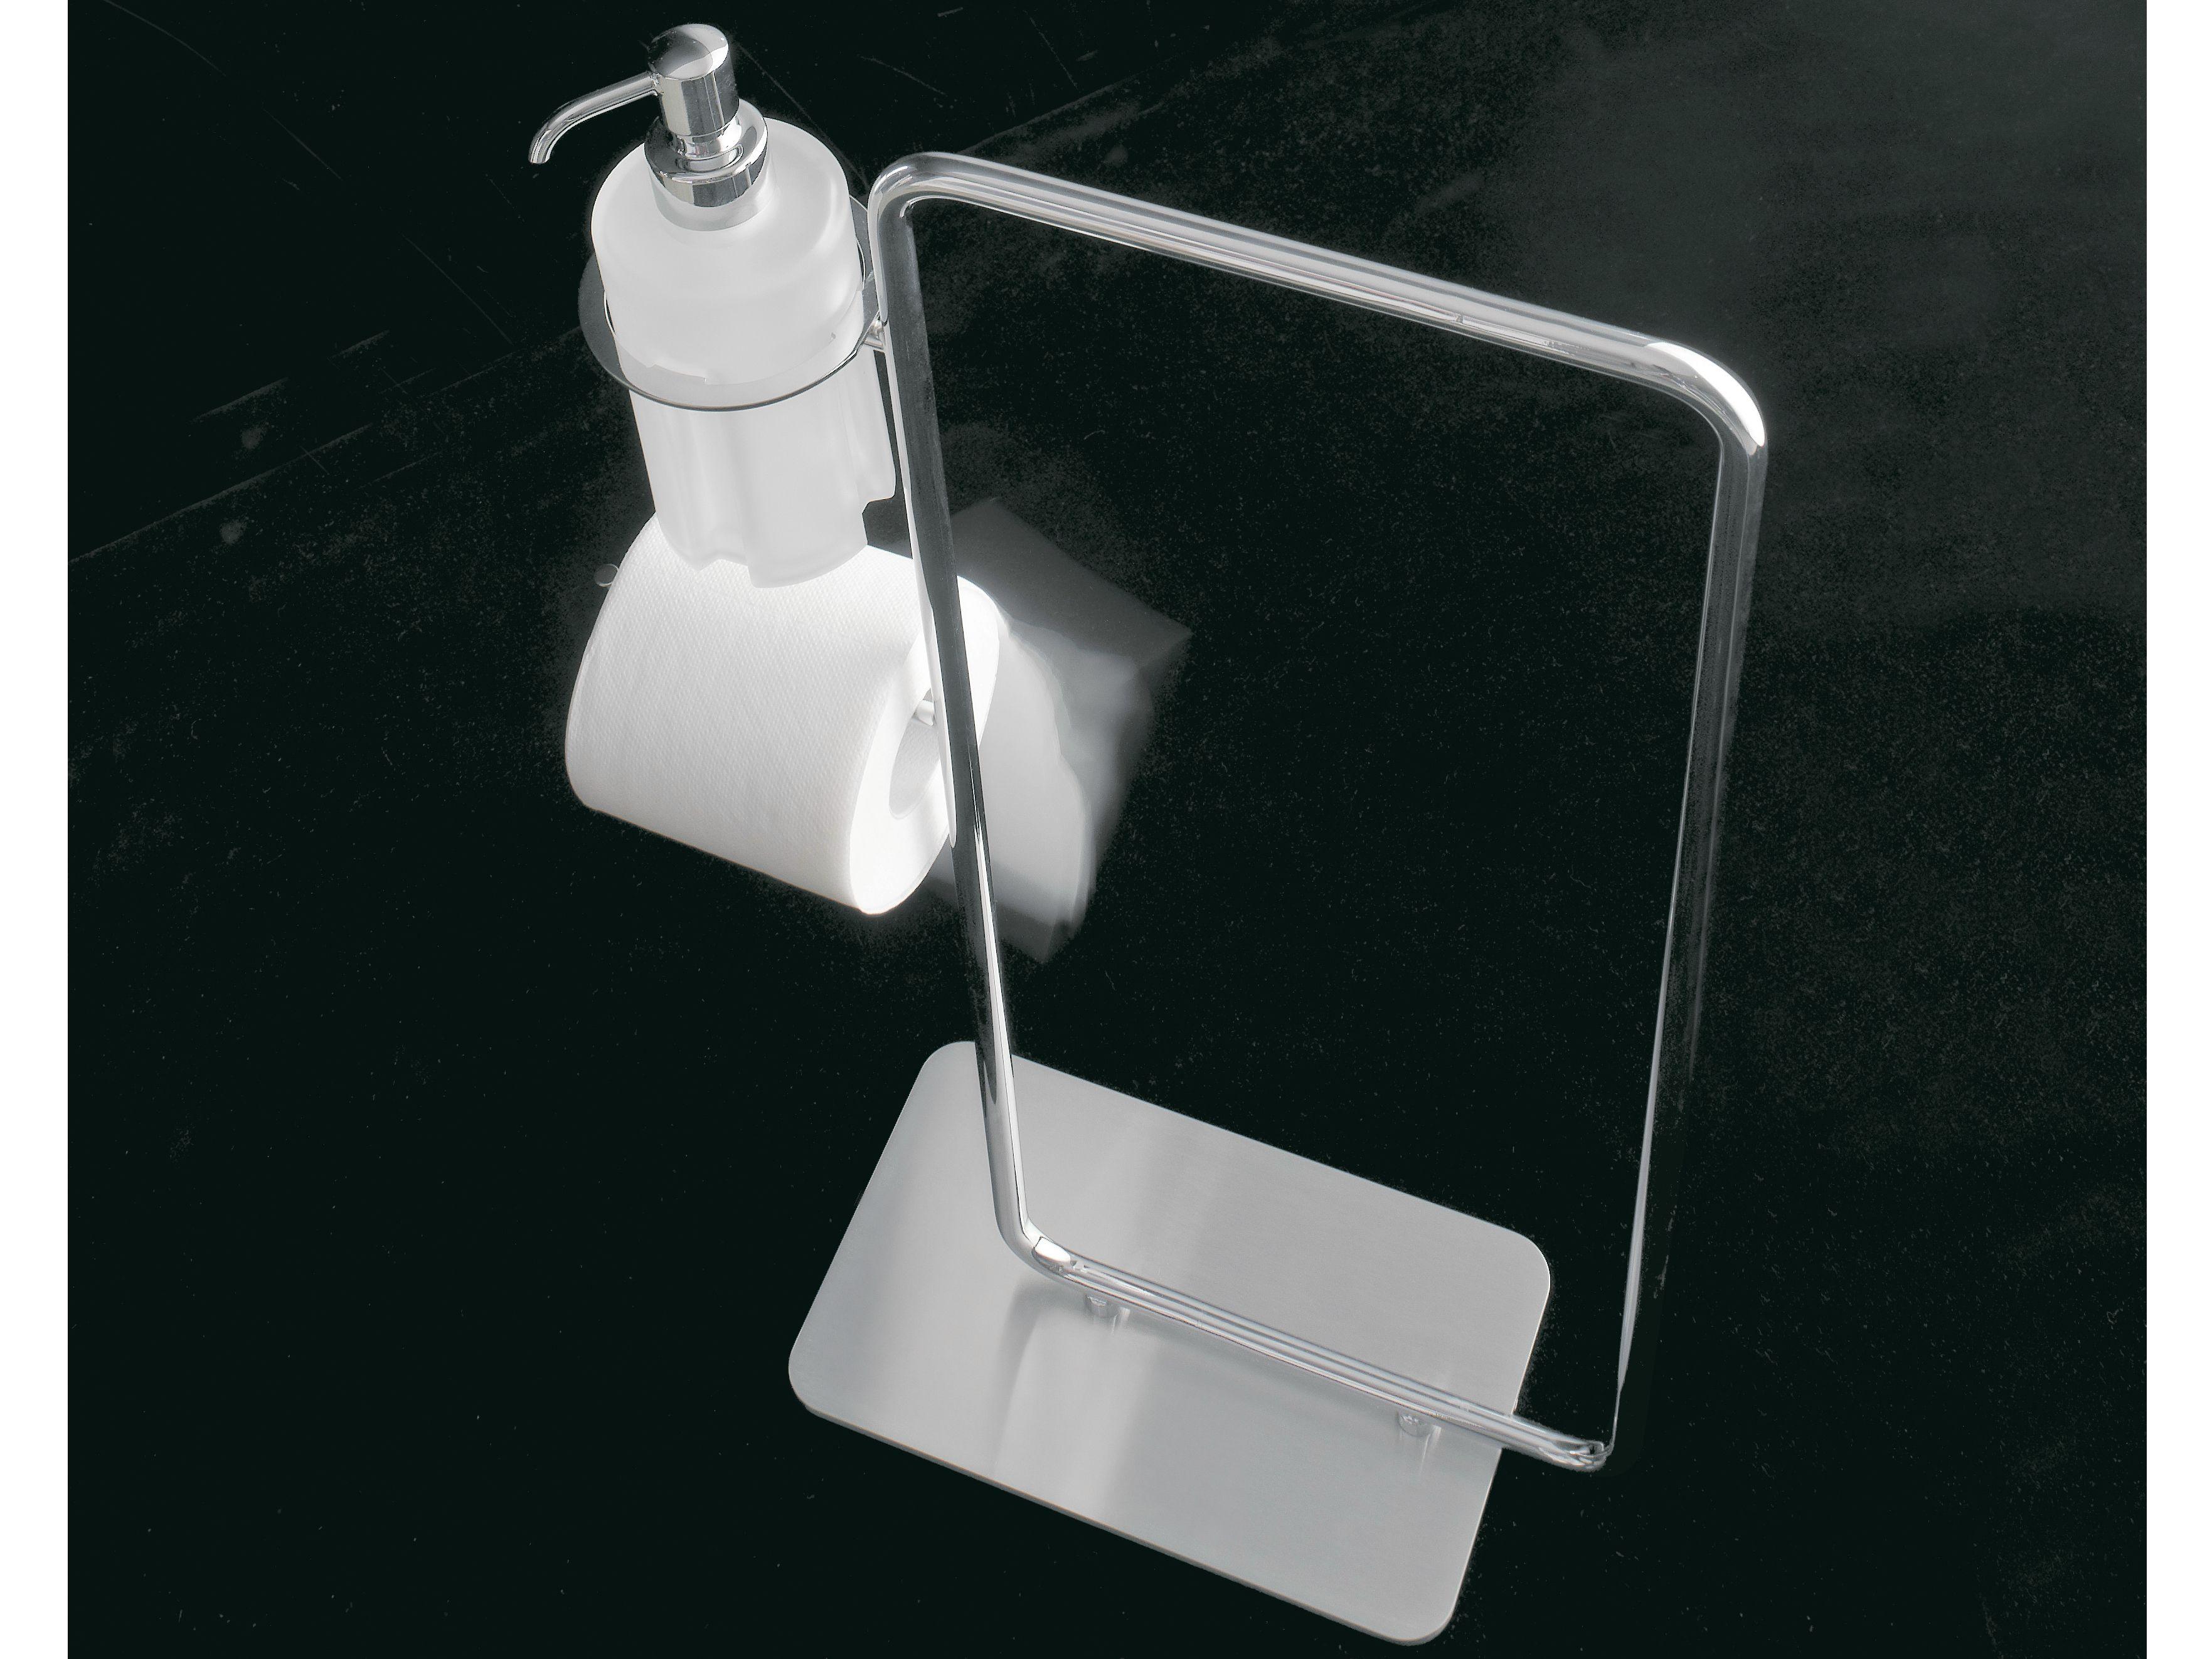 Porta asciugamani da terra collezione 8500 by rubinetterie 3m - Porta tv da terra ...